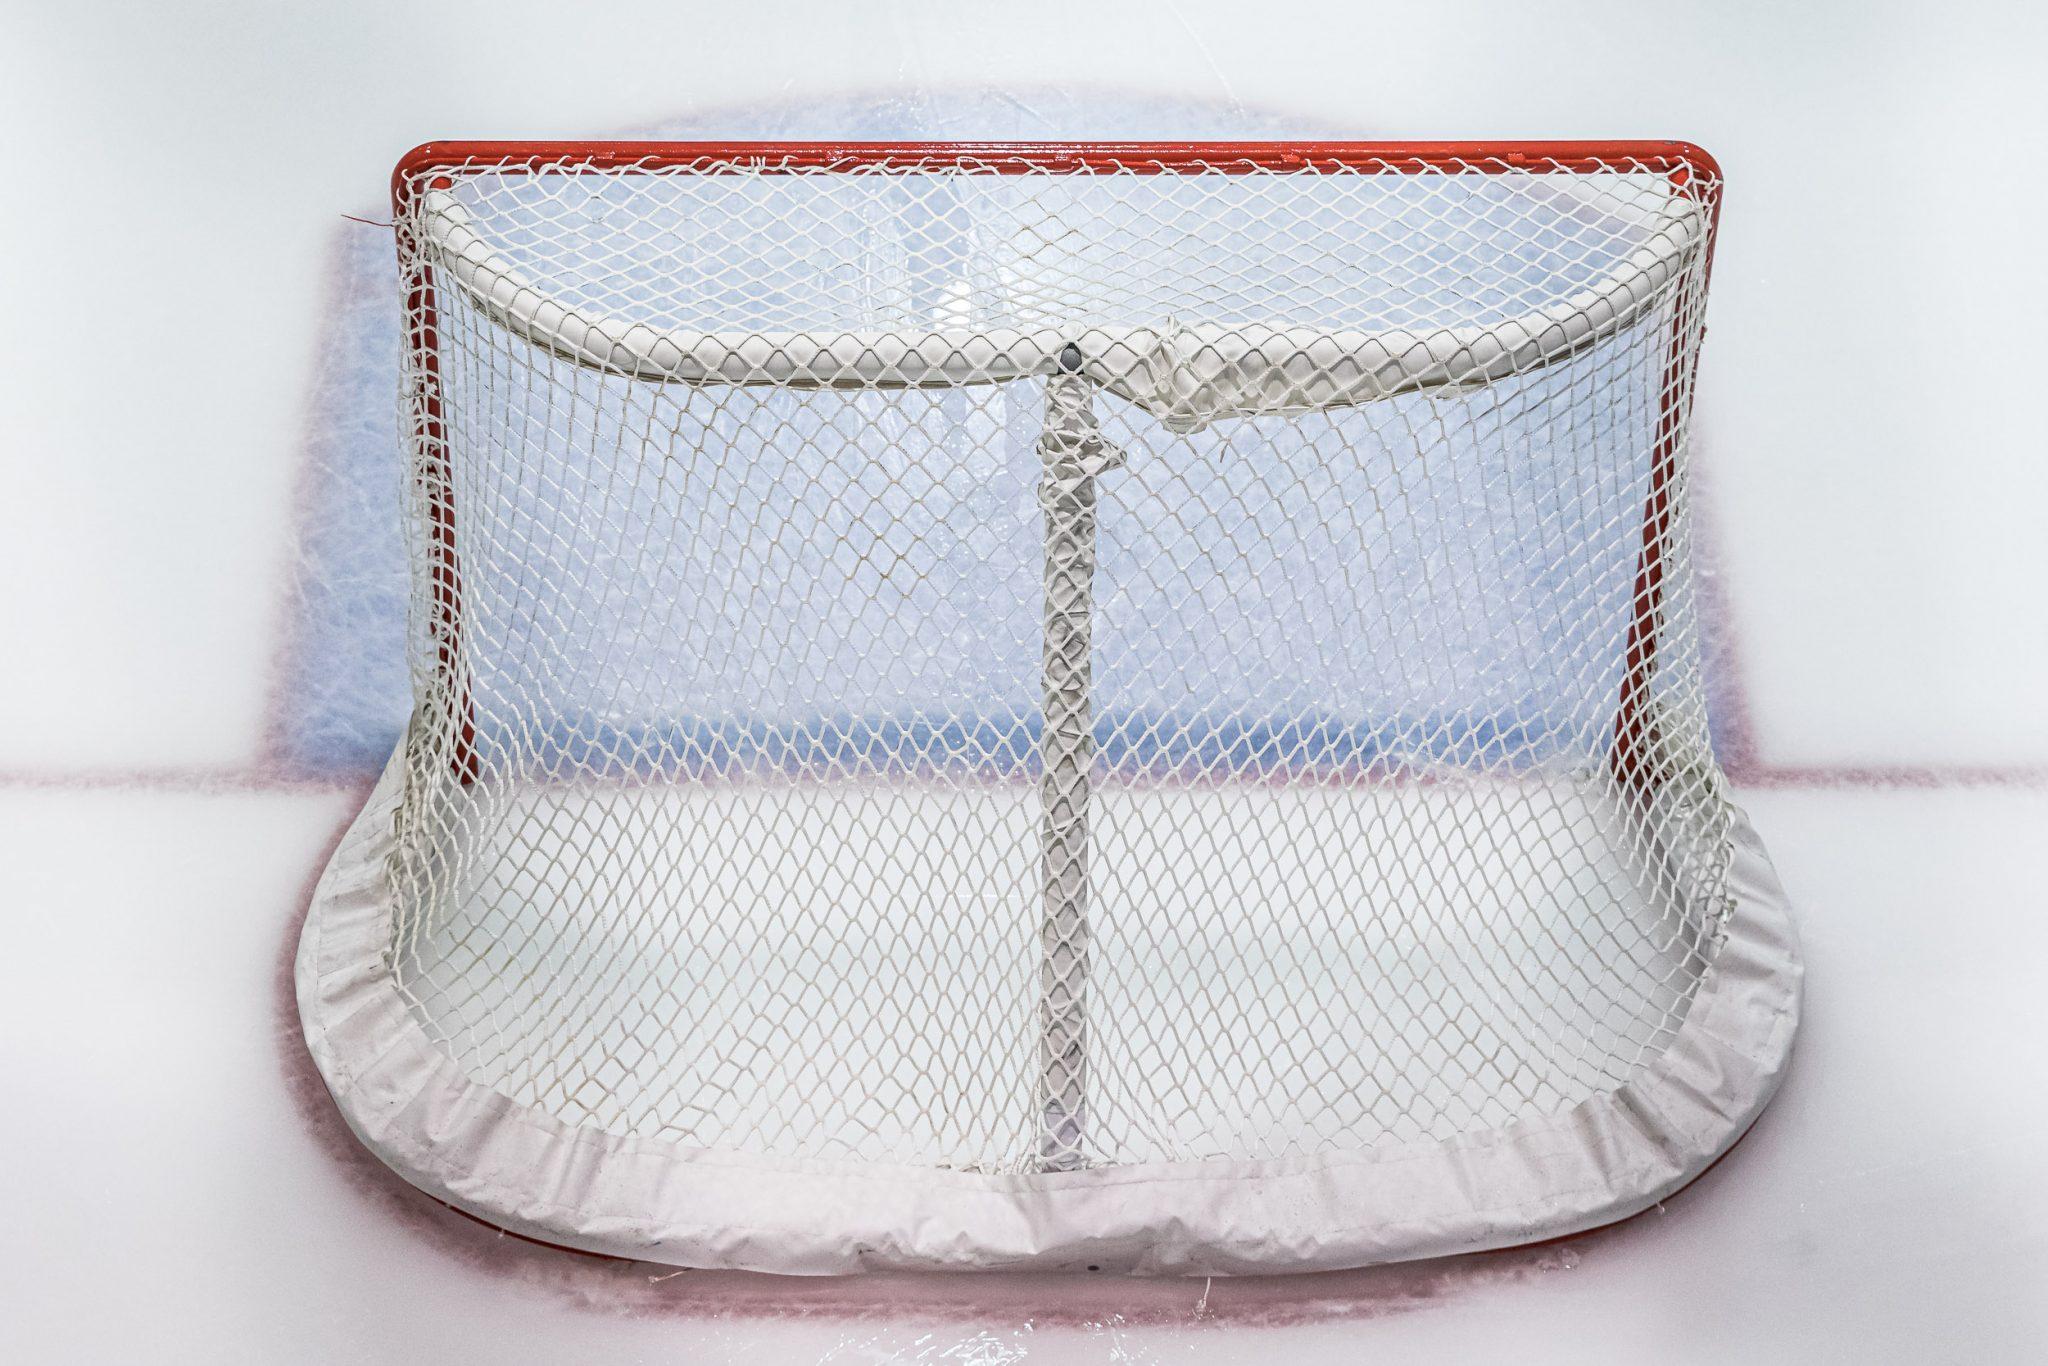 Ergebnis Eishockey Heute